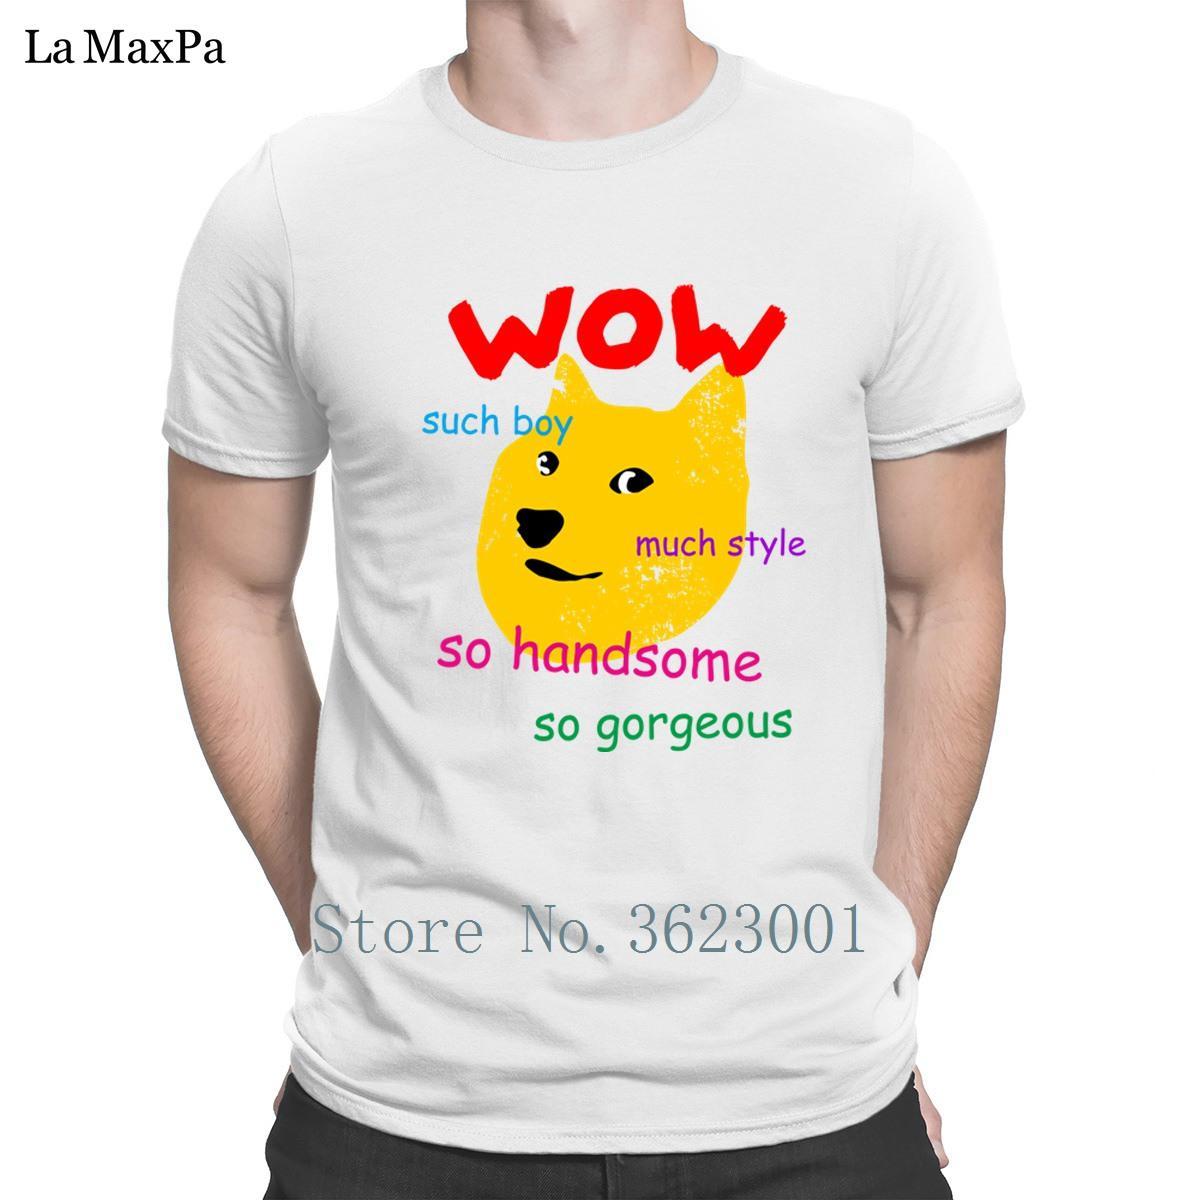 Design Natürliche T-Shirt für Männer Frühlings-Doge Shiba Solche Junge Mann Comical Fun Cotton Einfach-T-Shirt Hiphop